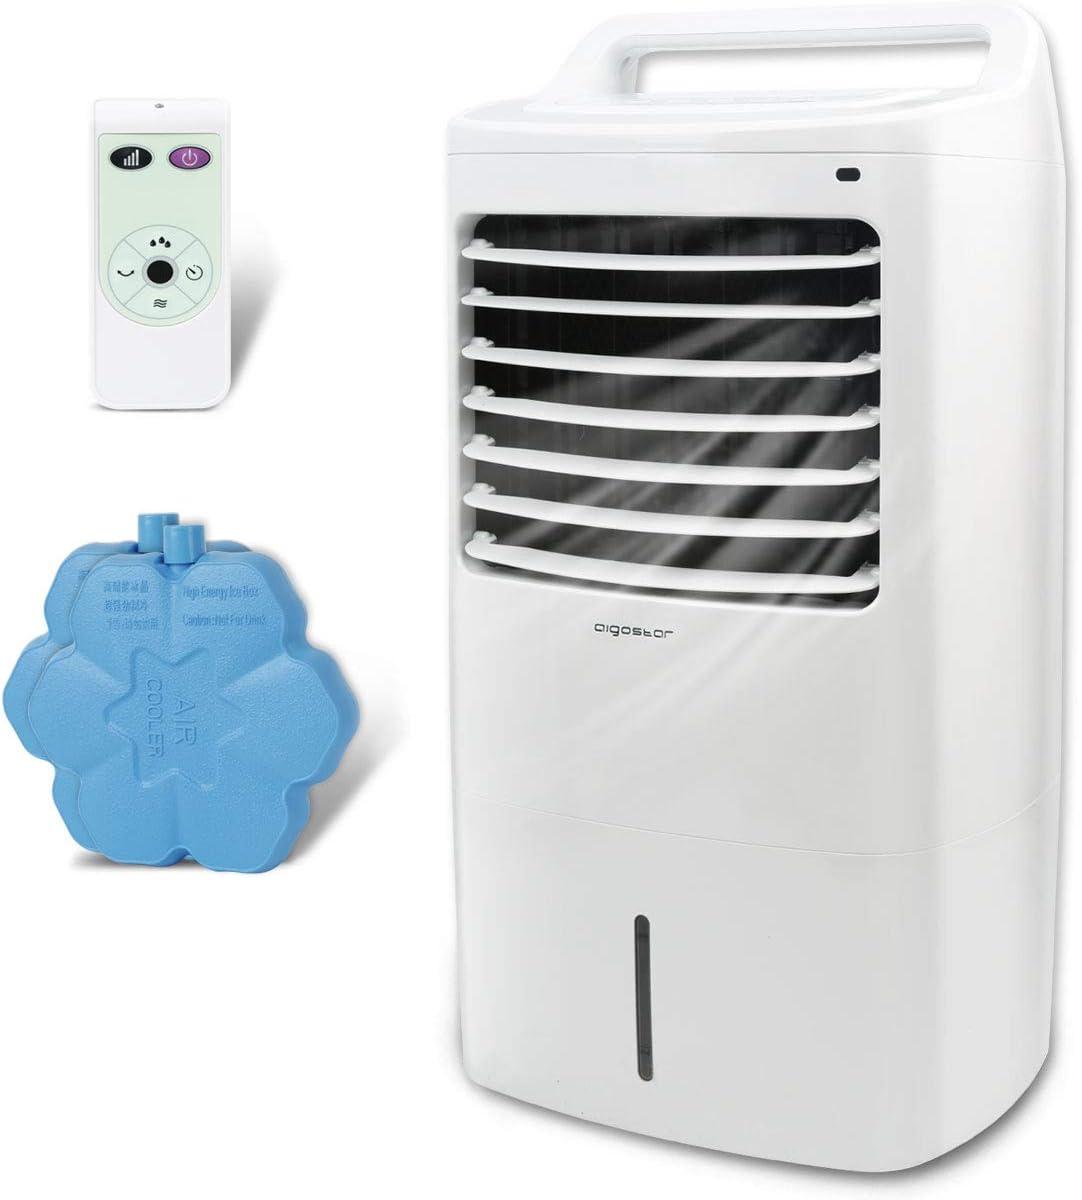 Aigostar - Climatizador evaporativo con mando a distancia, 60W, oscilante, 3 modos y 3 velocidades, temporizador, humidificador de aire, 2 cajas hielo, depósito de 15 l.